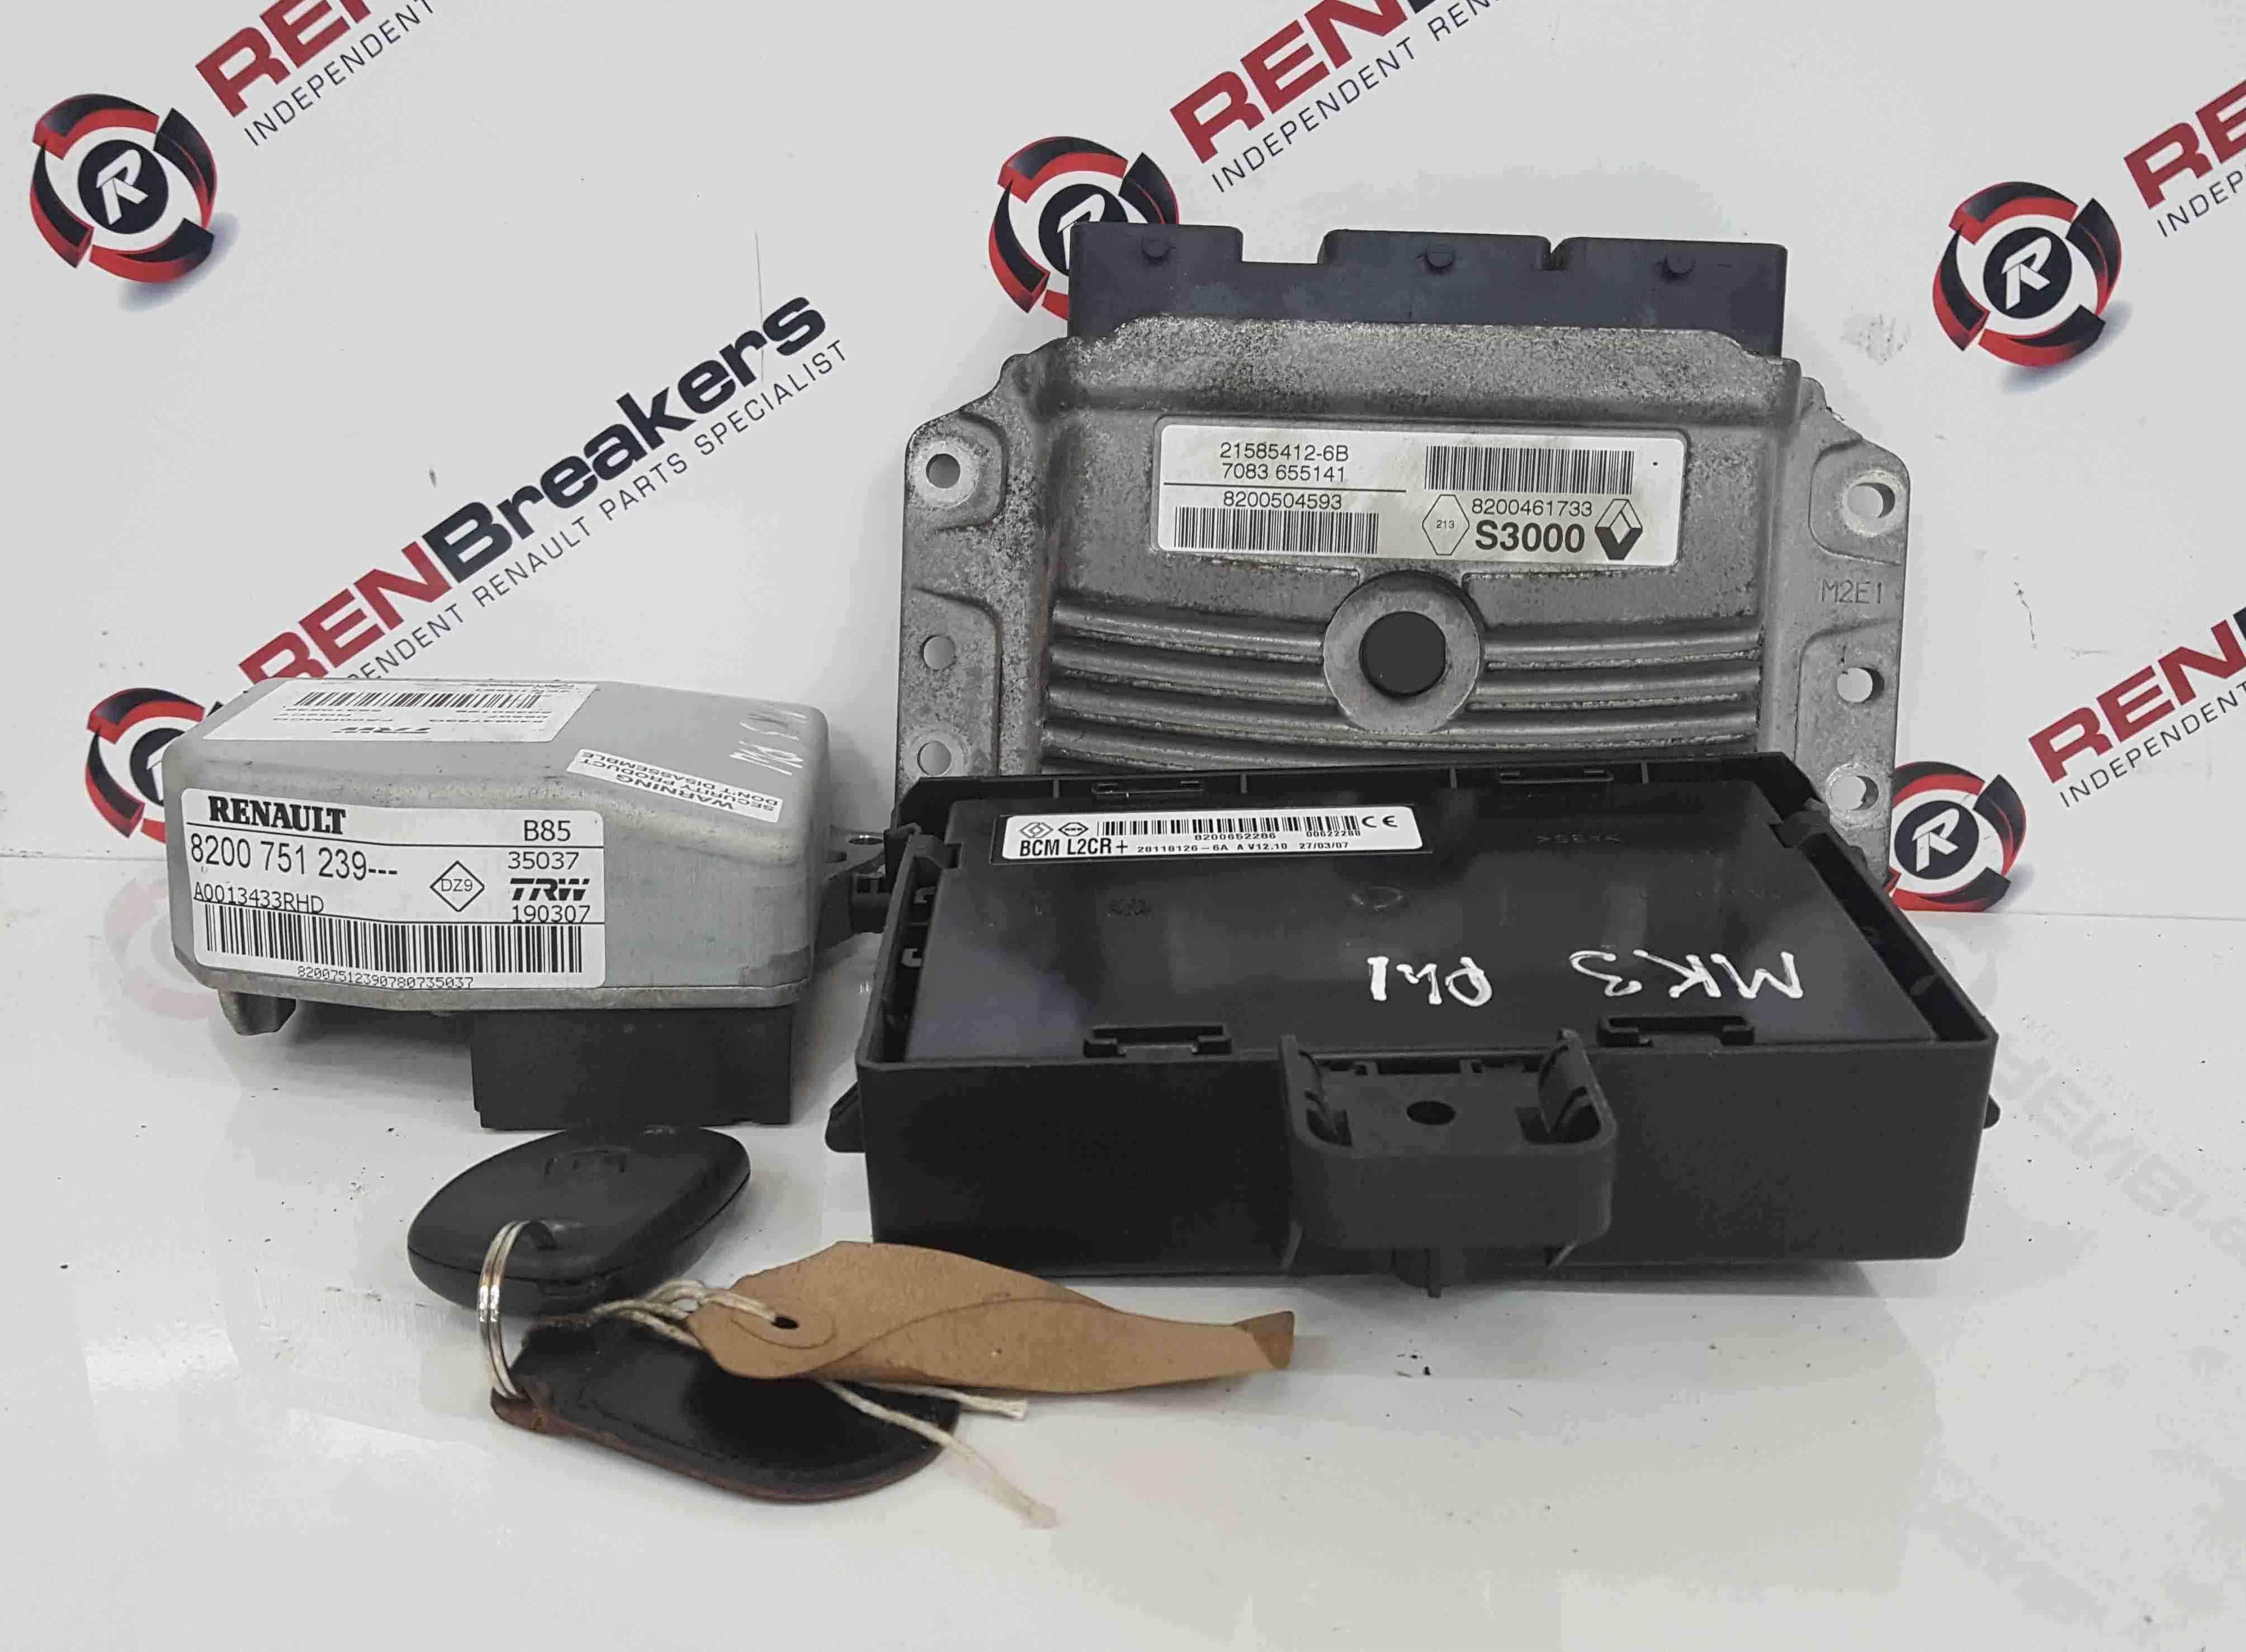 Renault Clio MK3 2005-2009 1.4 16v ECU Set UCH BCM Immobiliser Steering Key Fob